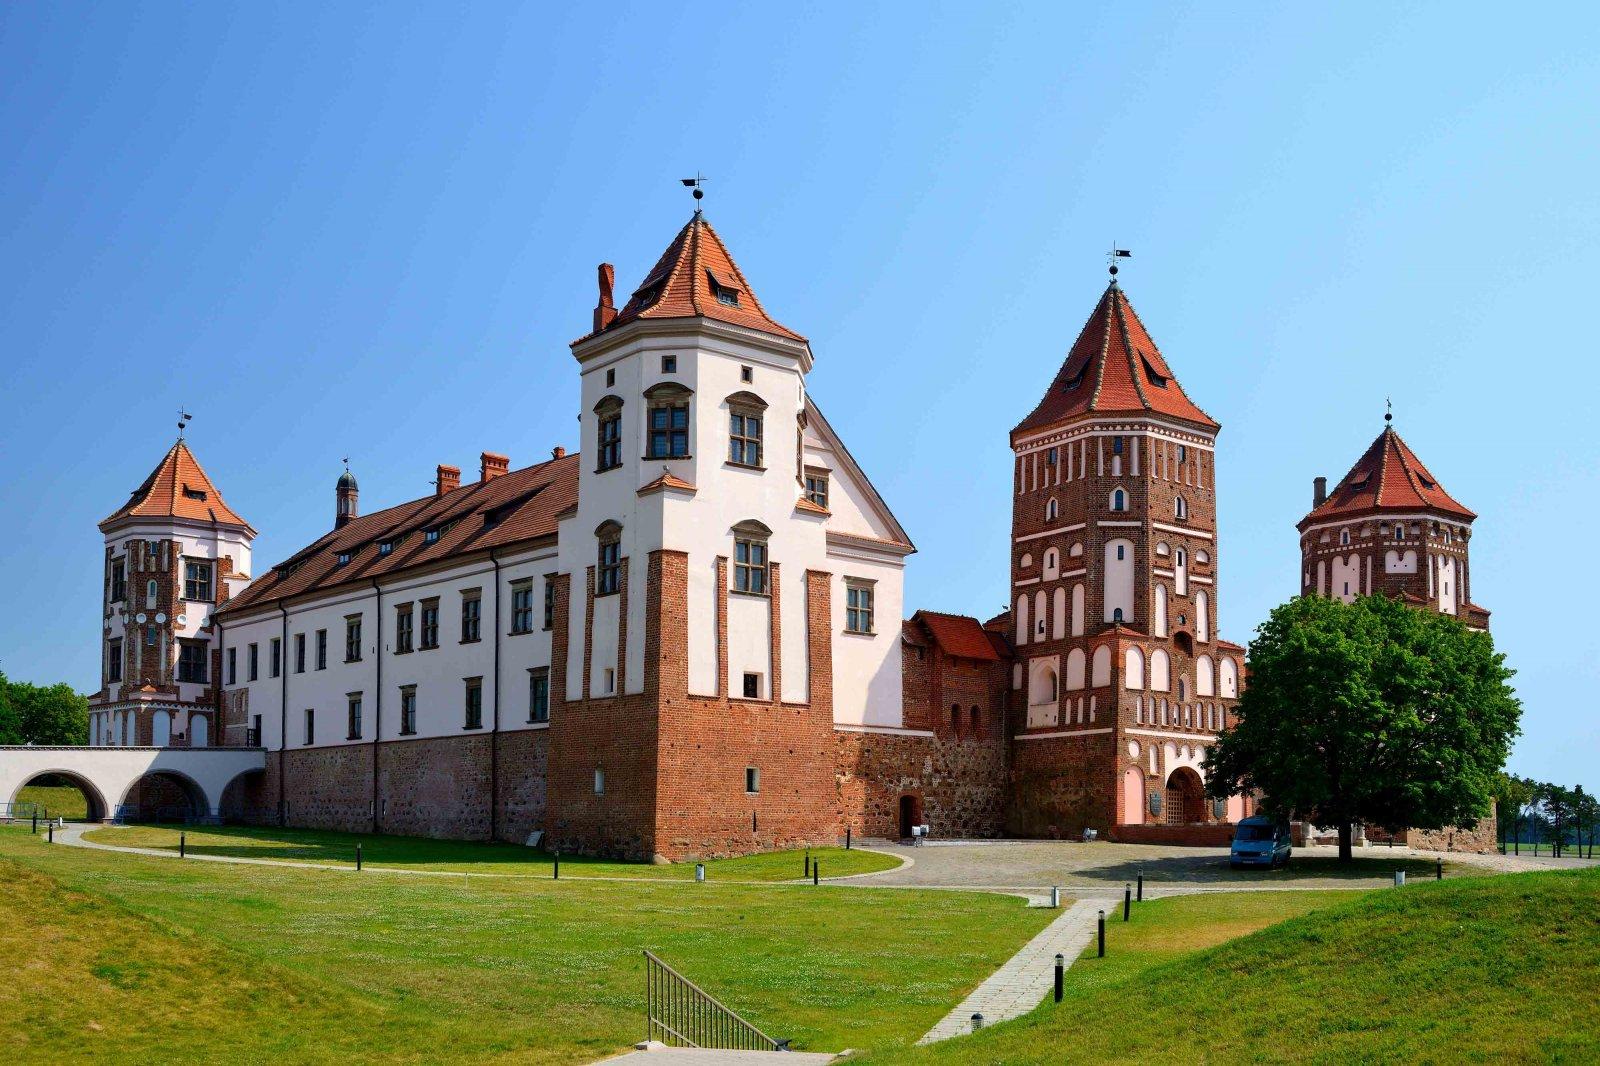 Дворец в Несвиже и замок в Мире — резиденции магнатов Радзивиллов